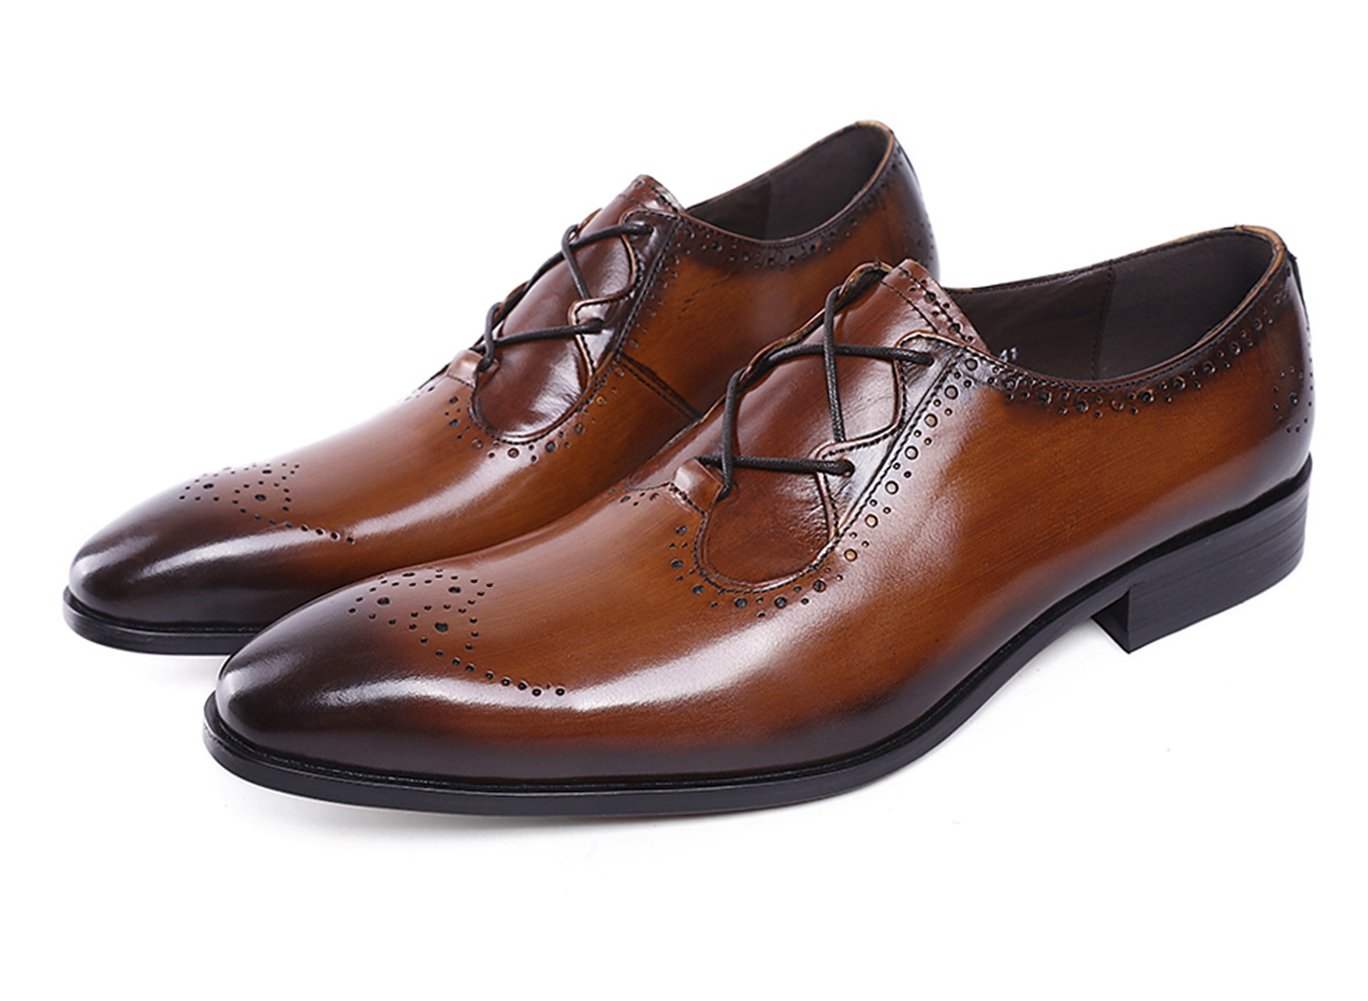 Felix Chu Men's Italian Designer Luxury Perfect Genuine Calf Leather shoes, Brown, 9 D(M) US by Felix Chu (Image #2)